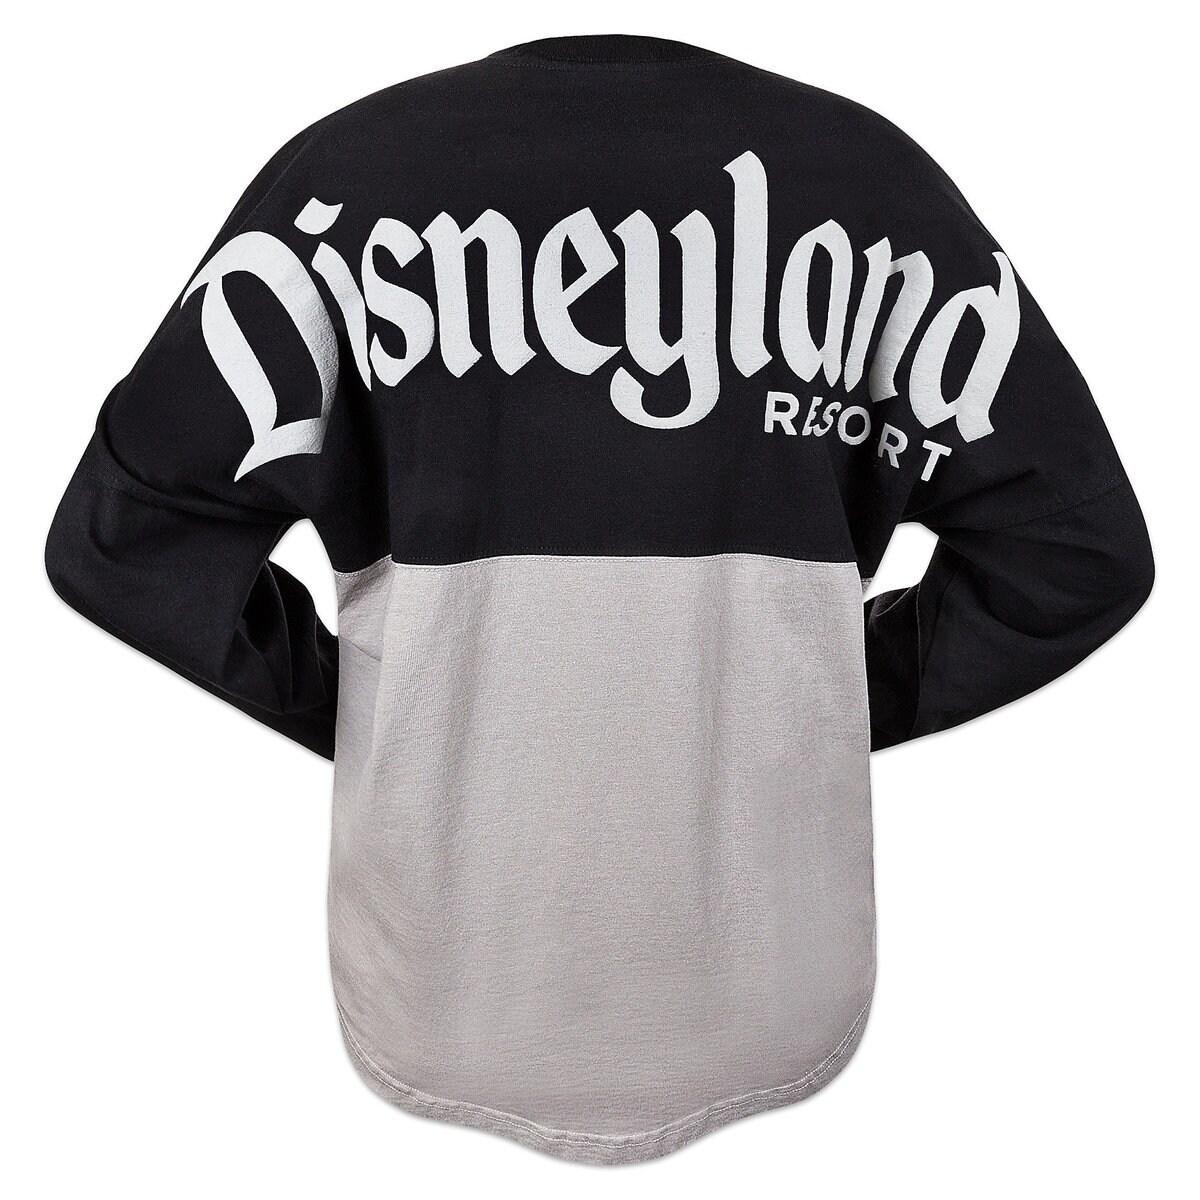 Disneyland Shirts tPcCBgOEd